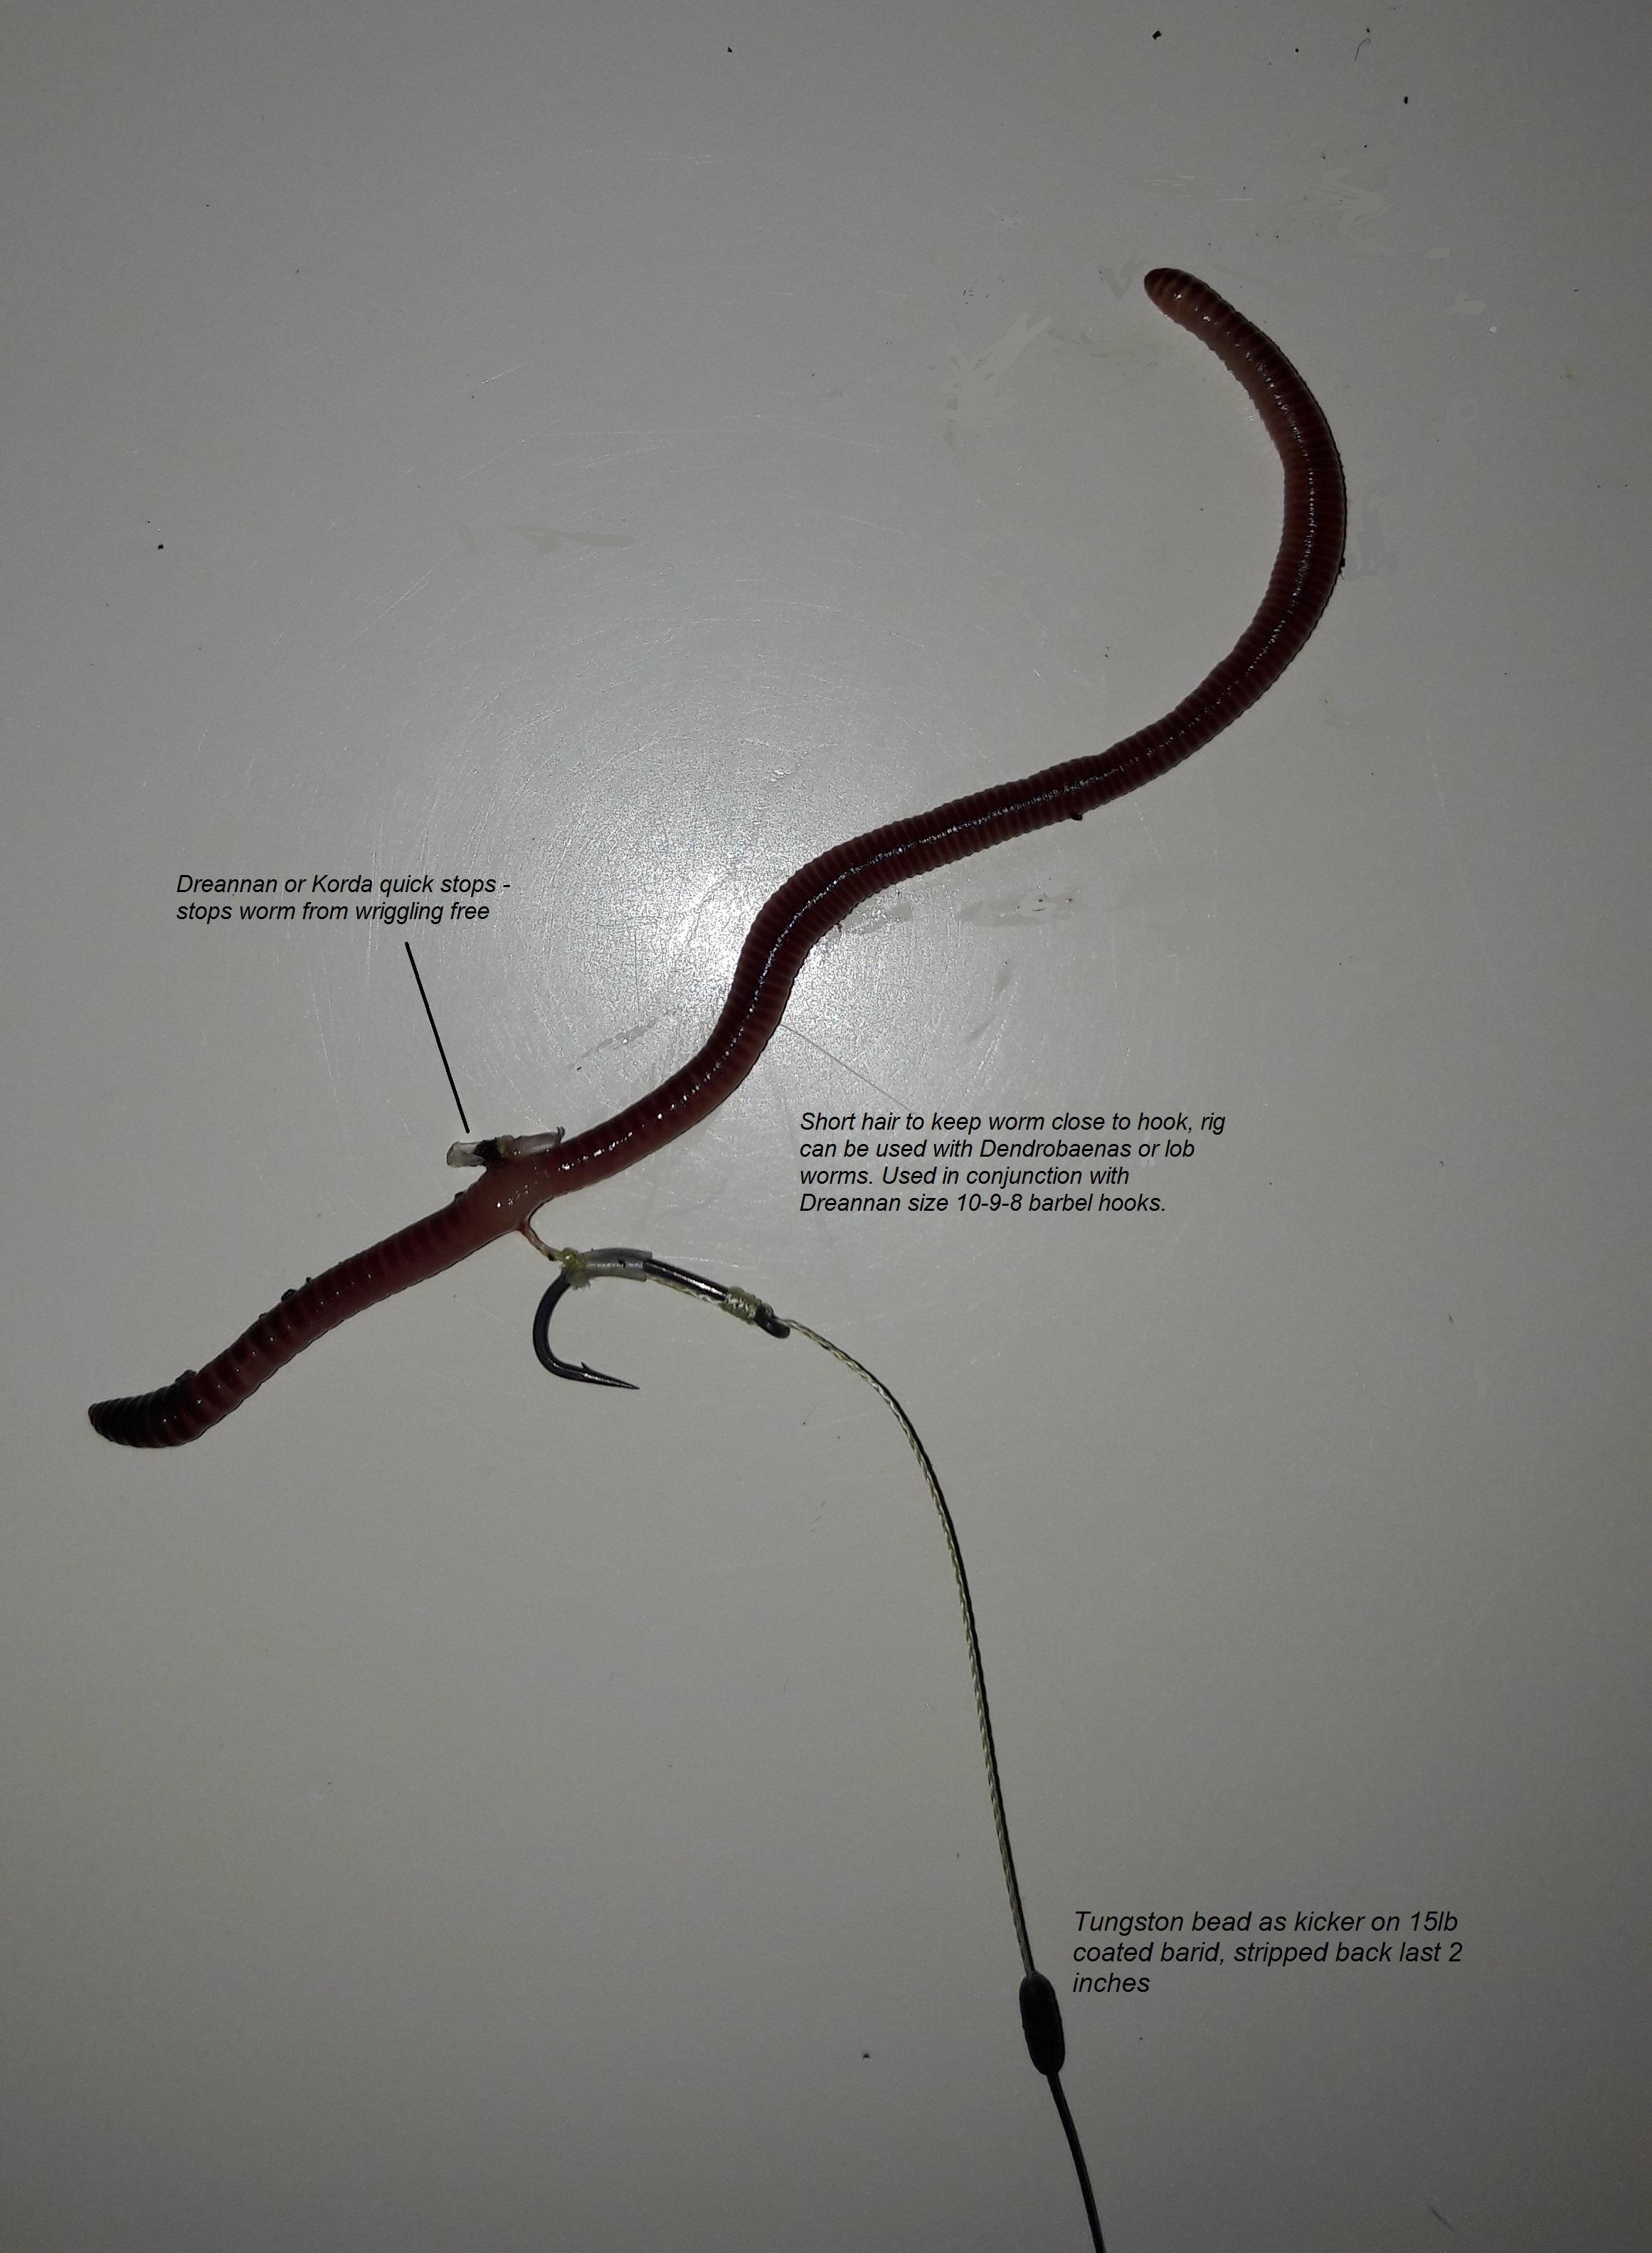 carp course fishing hooks size 8 barbless CG 10 pcs hair rigs 15lb